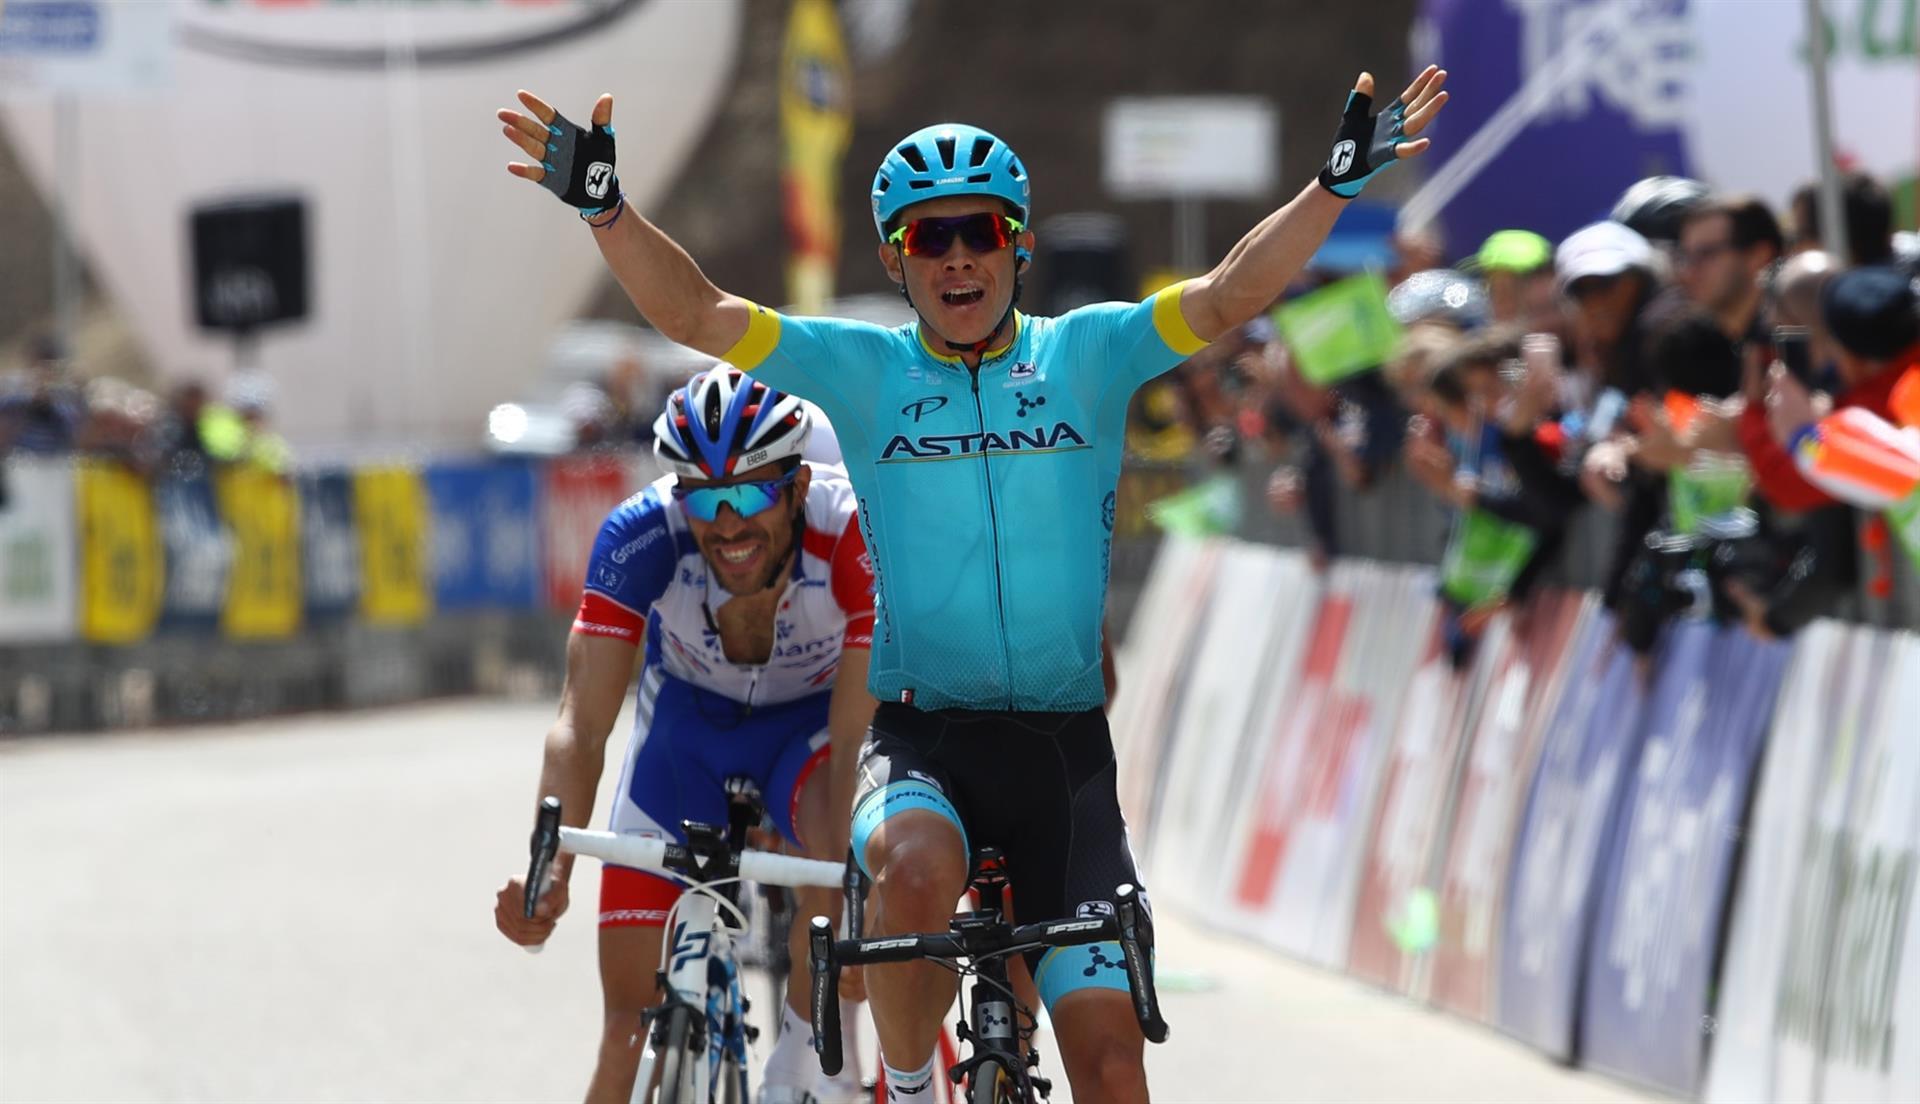 Miguel Angel Lopez vince la seconda tappa del Tour of the Alps